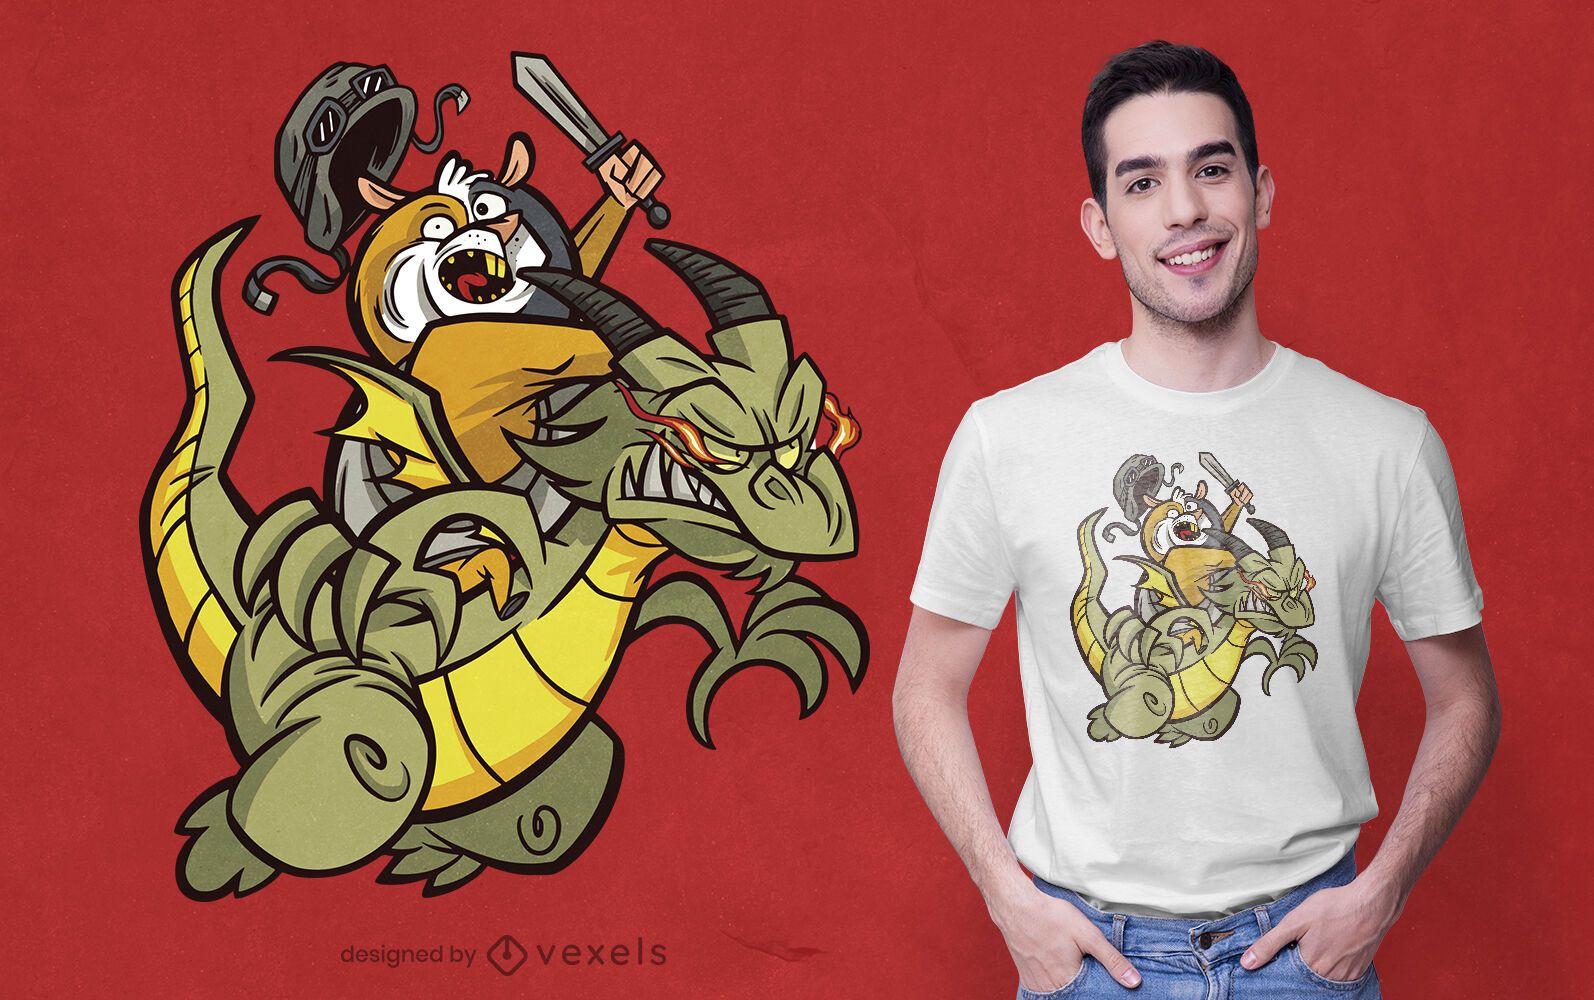 Guinea pig dragon warriors t-shirt design